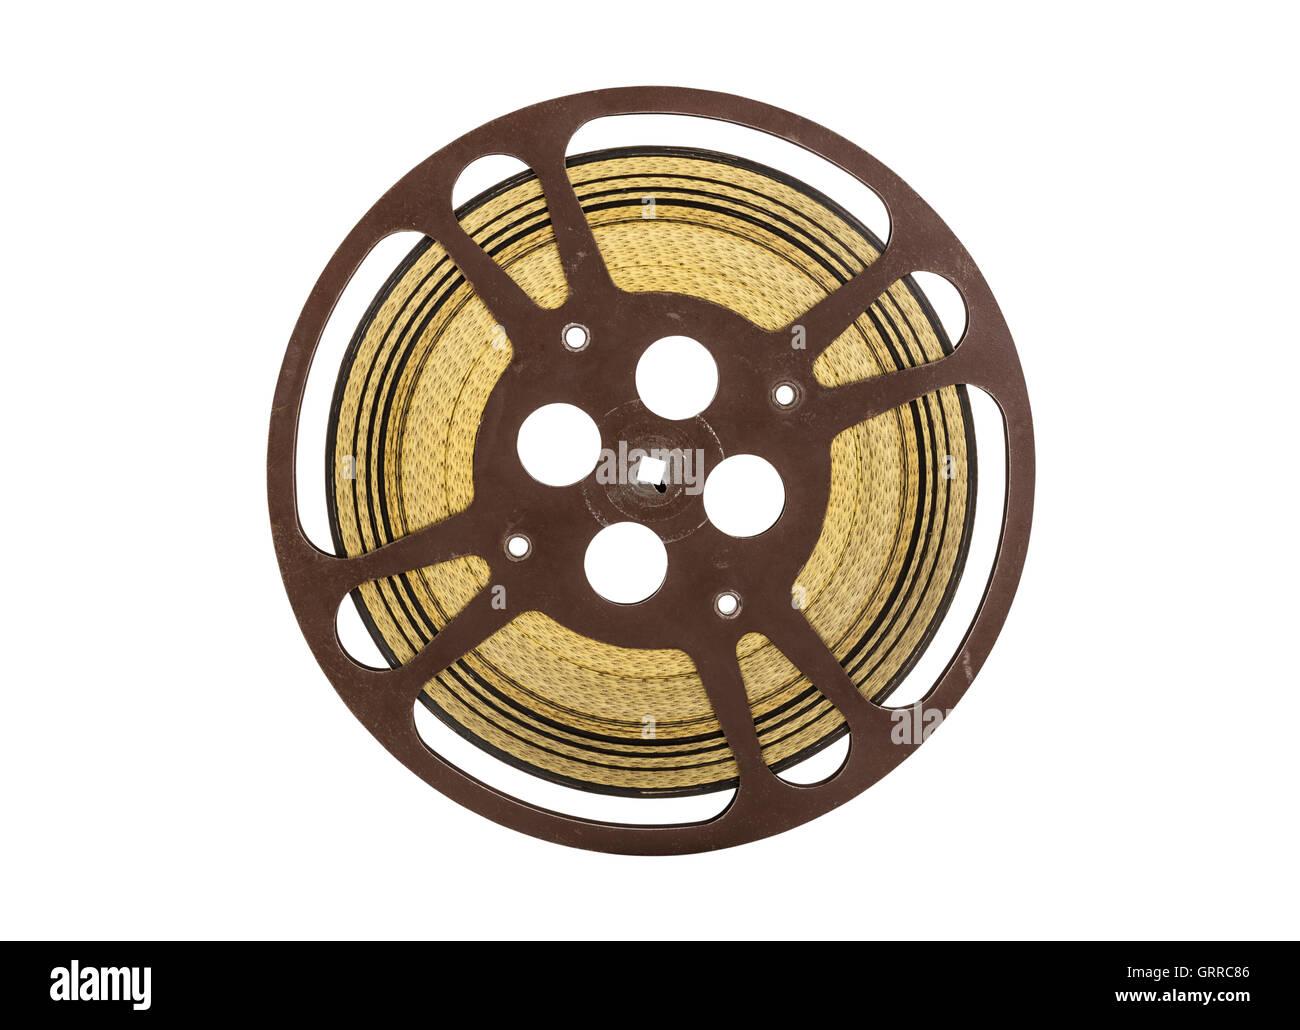 Vintage 16 mm movie film reel isolated on white. - Stock Image